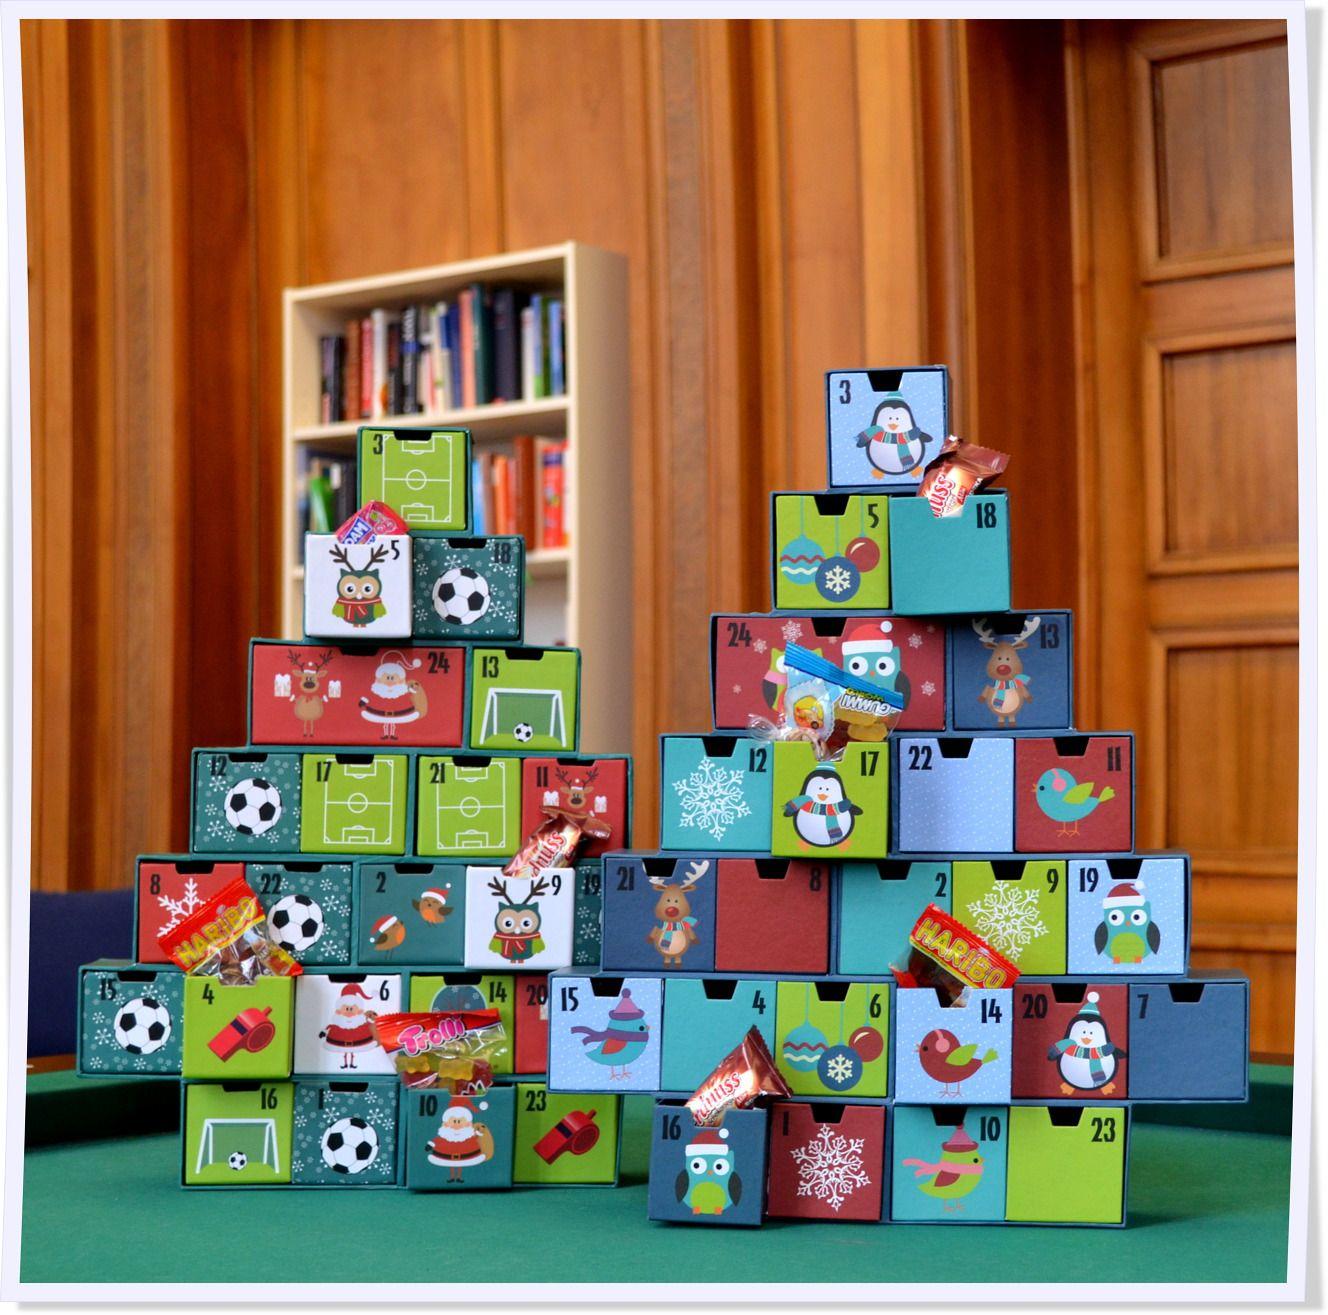 adventskalender 10 geschenkideen zum bef llen mytoys blog. Black Bedroom Furniture Sets. Home Design Ideas